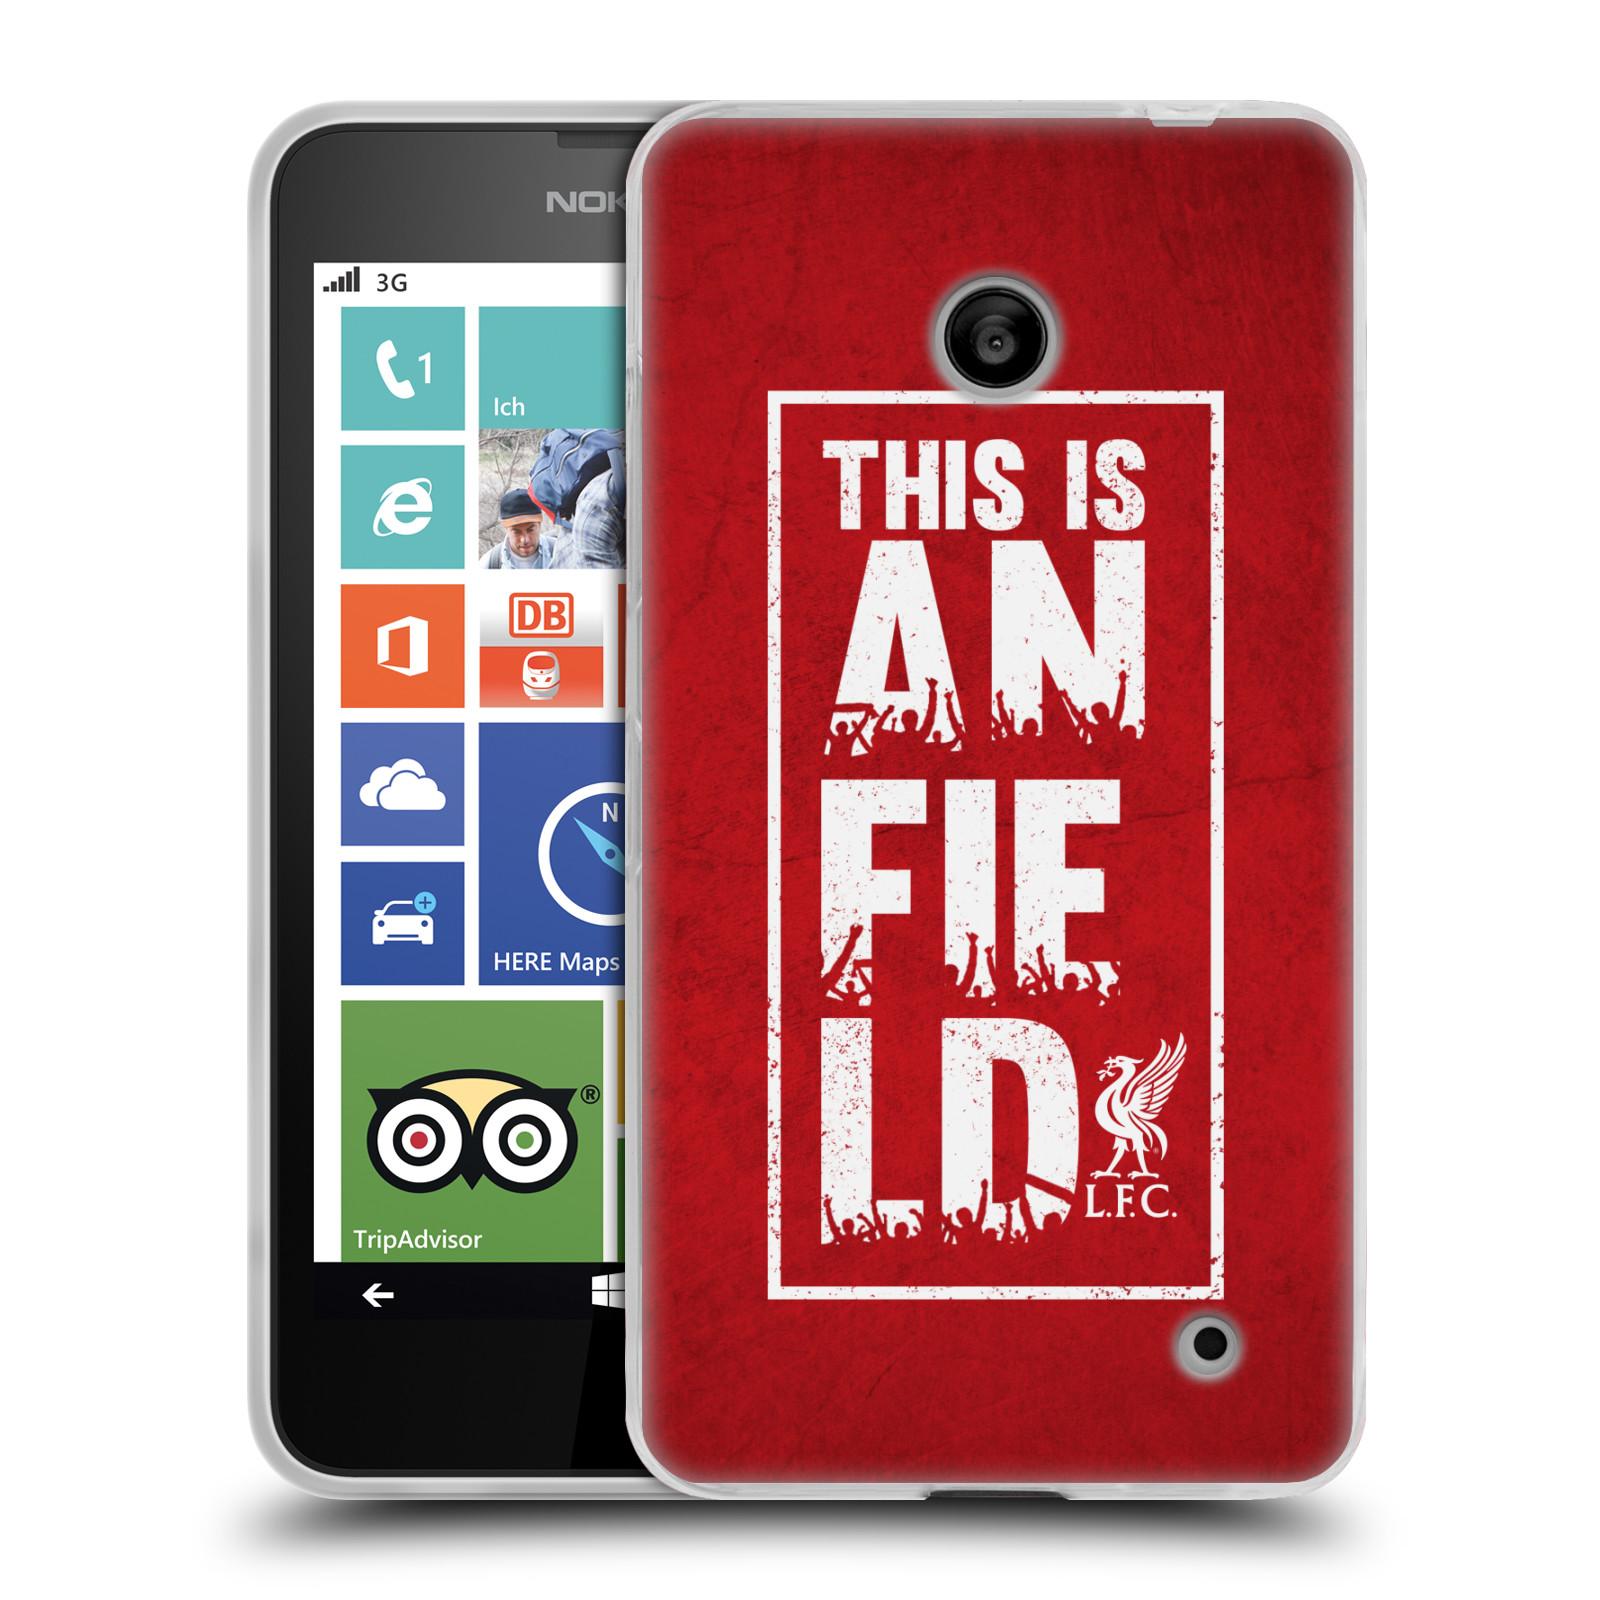 Silikonové pouzdro na mobil Nokia Lumia 630 HEAD CASE Liverpool FC This Is Anfield Red (Silikonový kryt či obal na mobilní telefon Liverpool FC Official pro Nokia Lumia 630 a Nokia Lumia 630 Dual SIM)